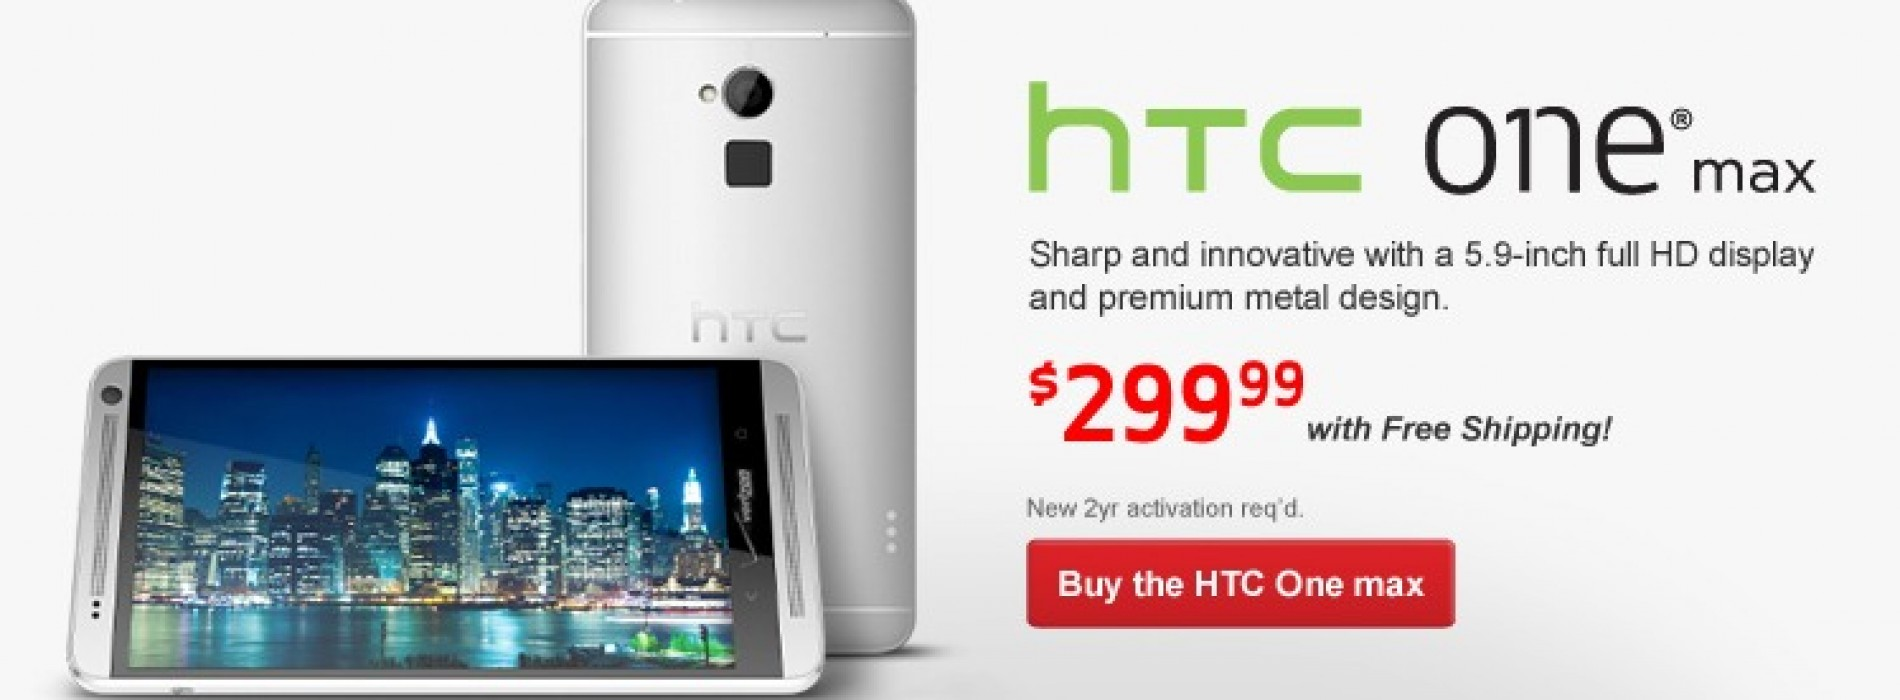 Verizon now offering $300 HTC One Max